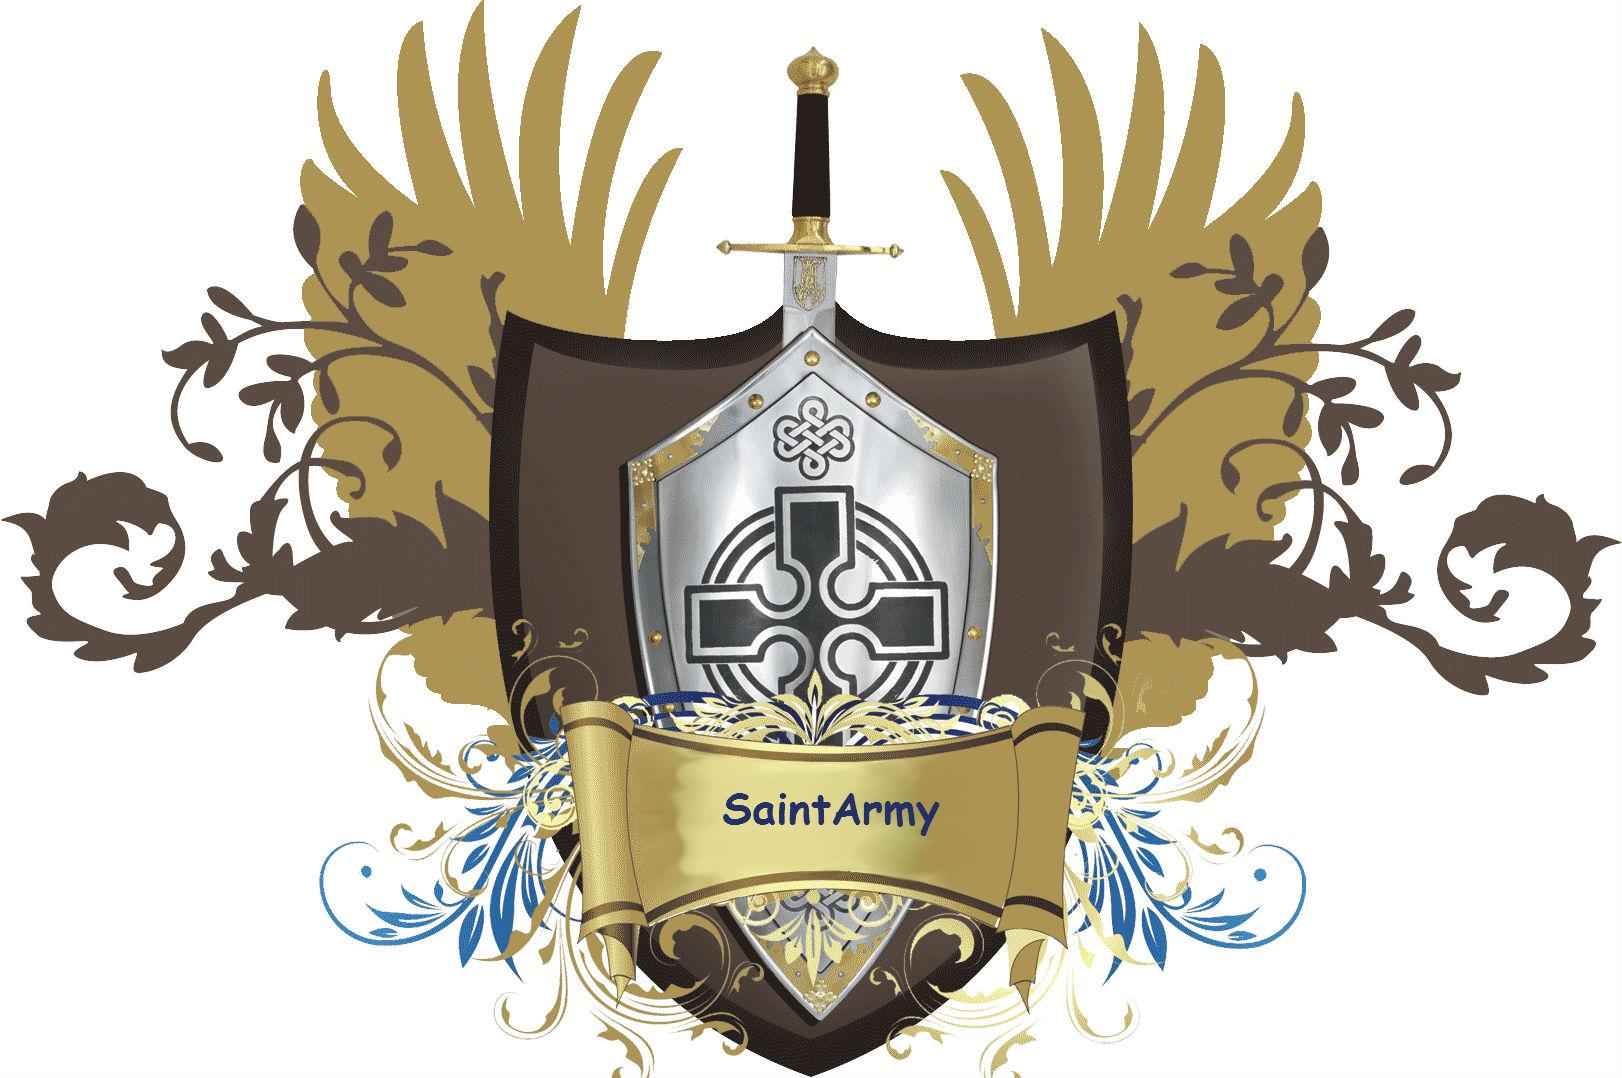 14 Октября 2013 - Saint Army